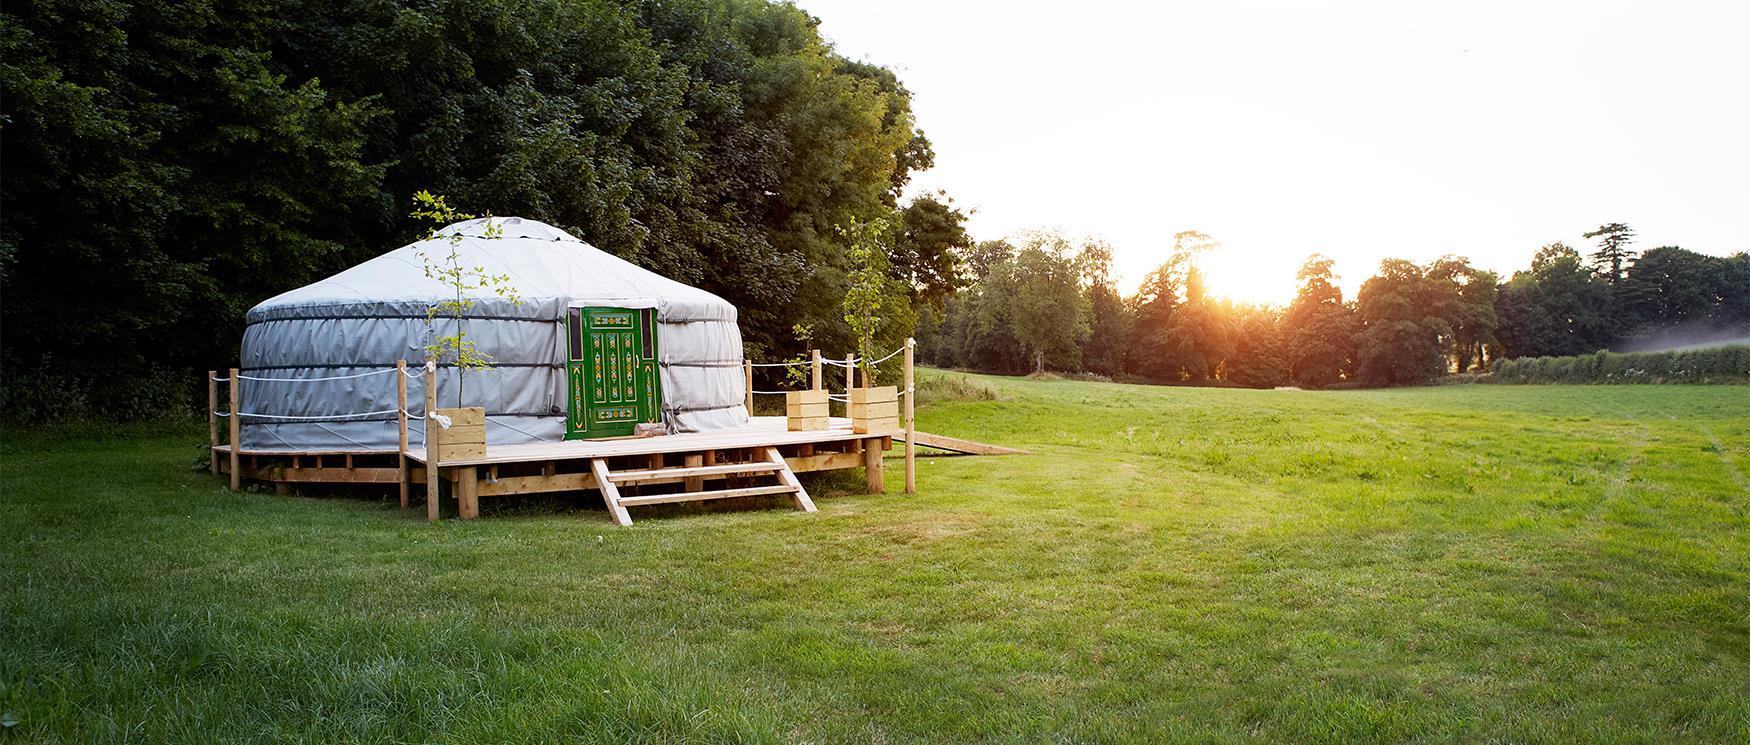 Yurt Glamping in Hampshire